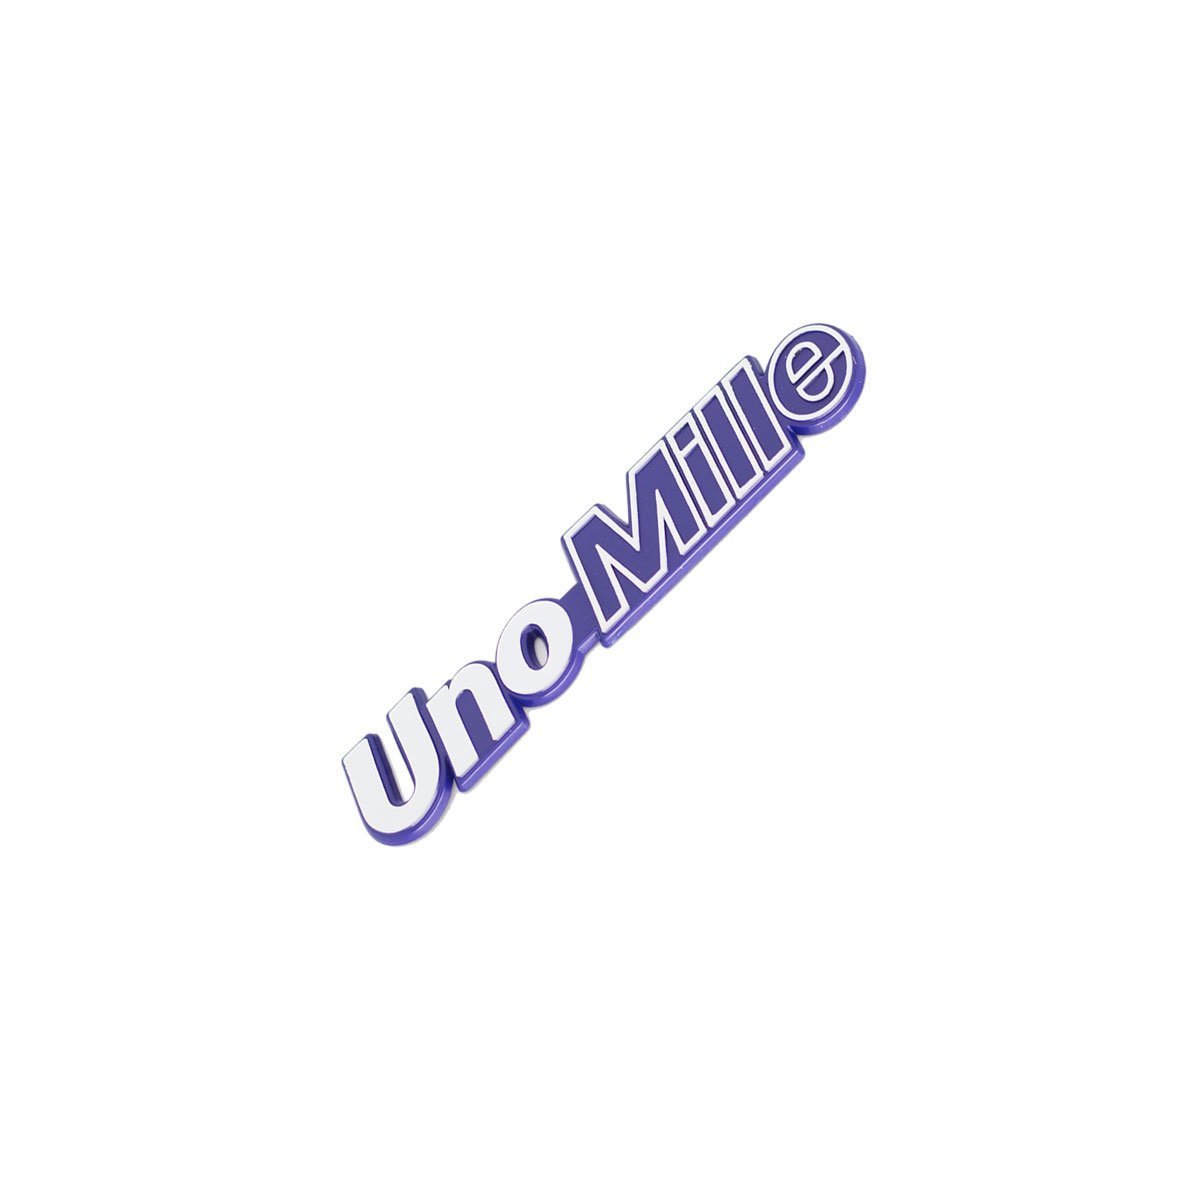 Emblema Uno Mille Cromado Fundo Azul